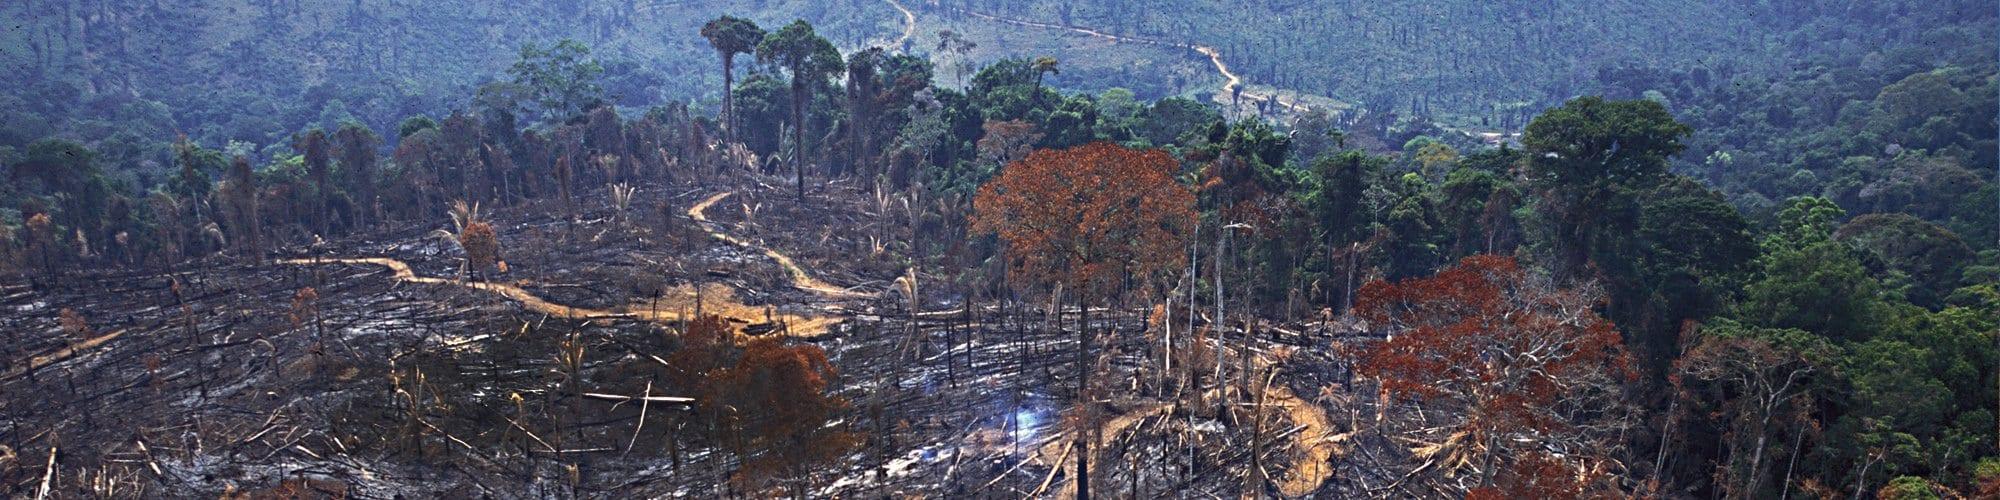 desmatamento3 - Deforestation